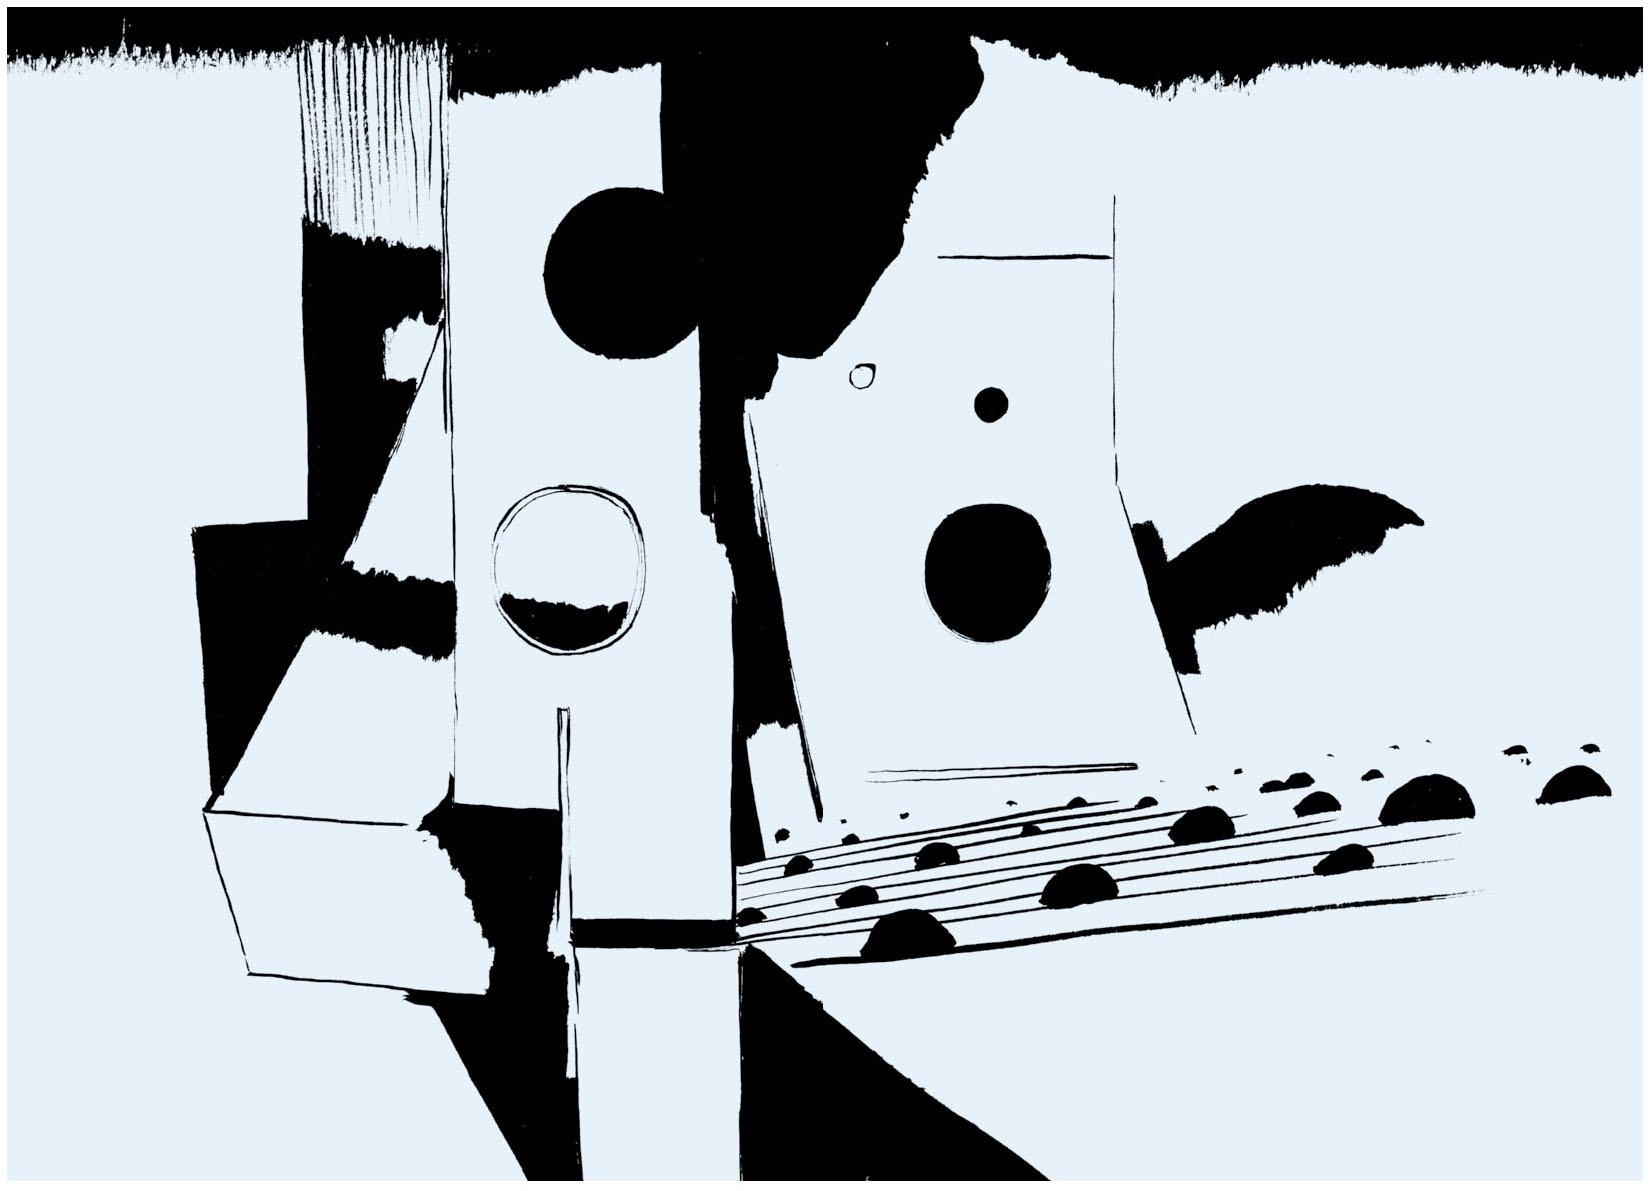 figure im15